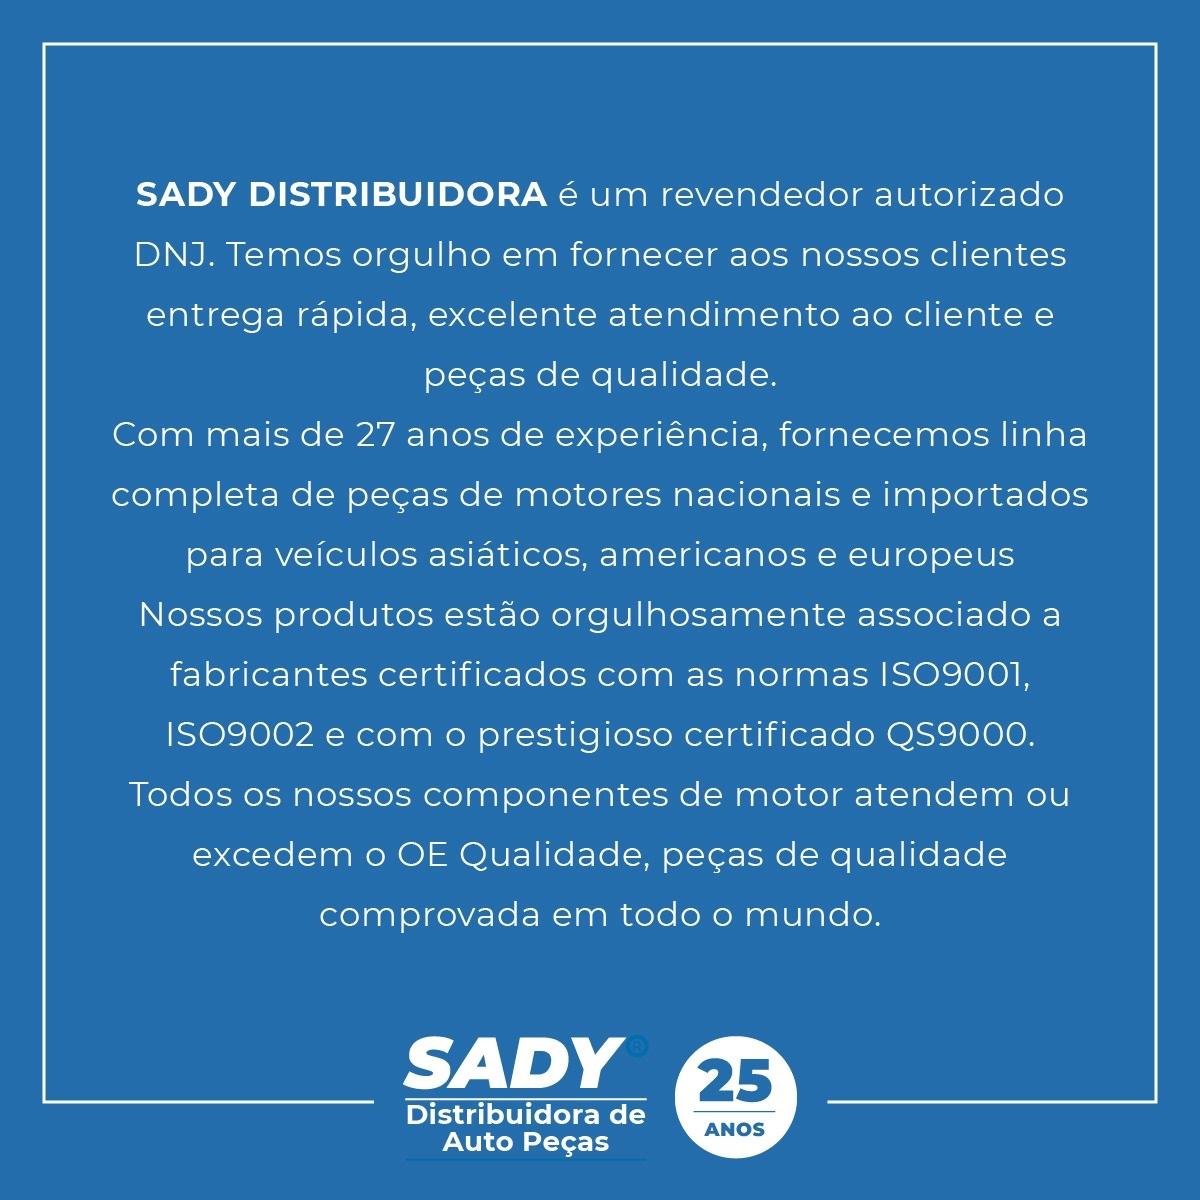 BOMBA DE OLEO DO MOTOR TOYOTA 2.7 16V 3RZ